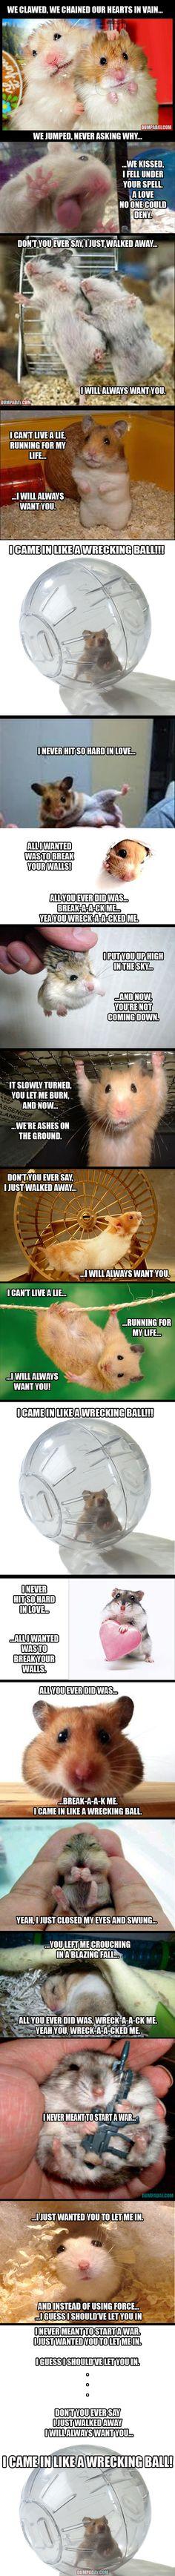 Wrecking Ball (Hamster Edition) – 20 Pics